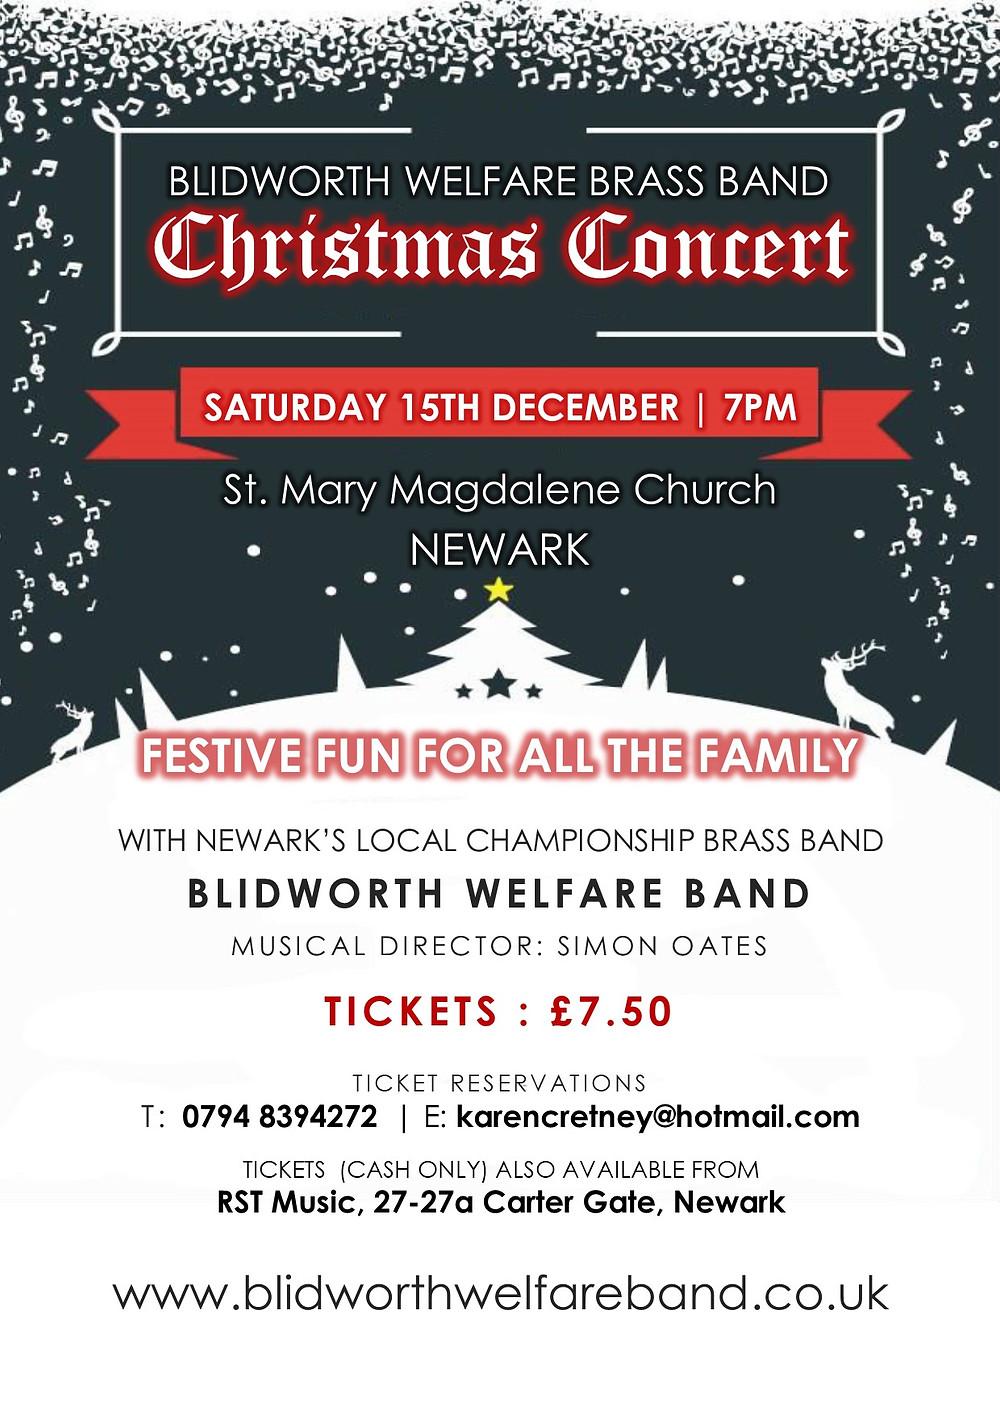 Christmas Concert in Newark